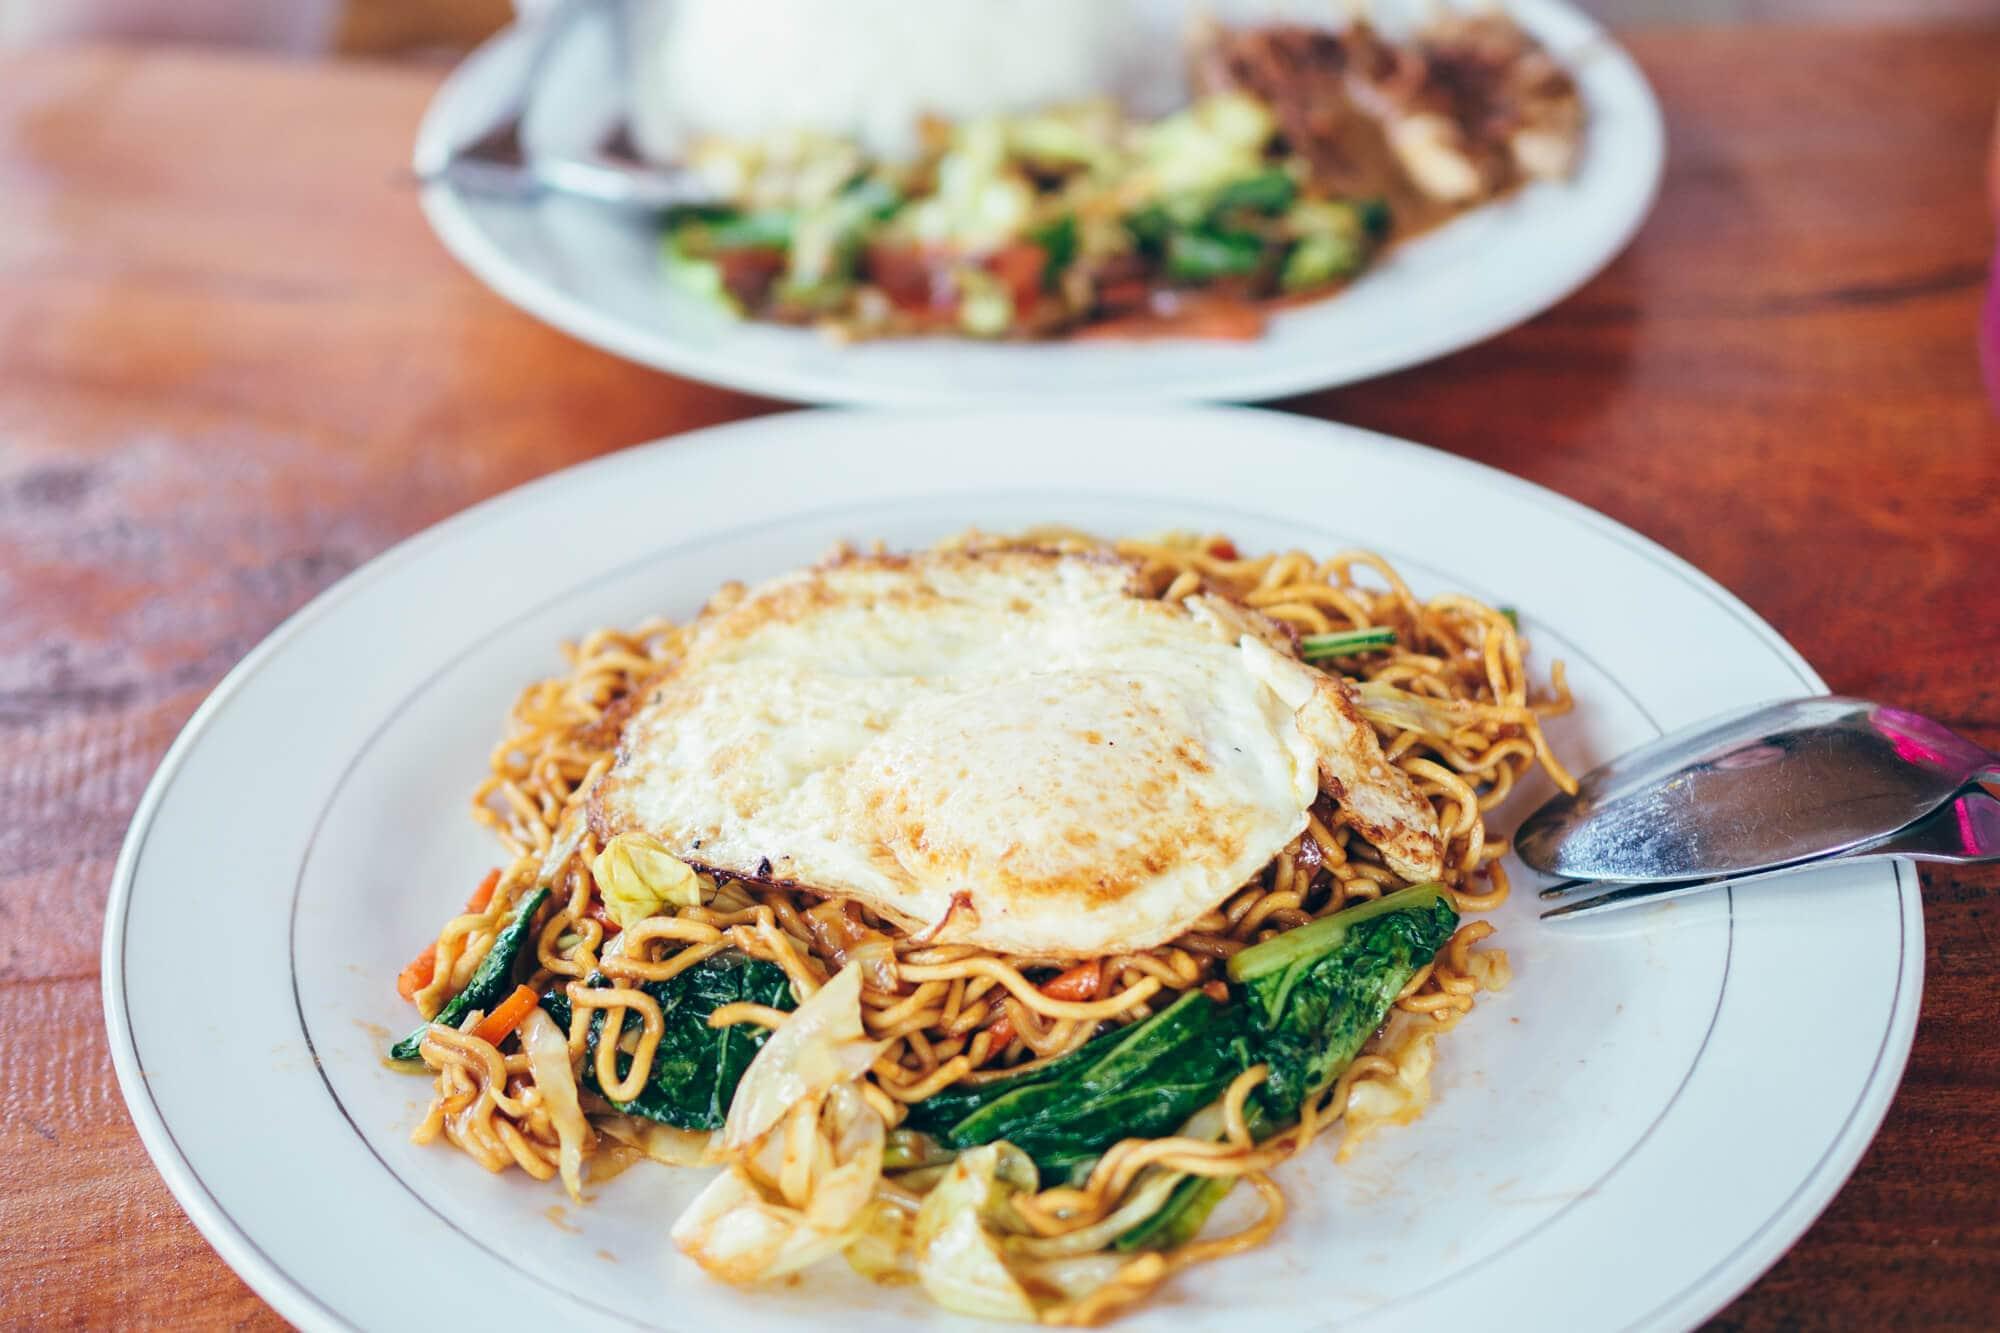 Mie Goreng (Indonesian fried noodles) in Nusa Penida